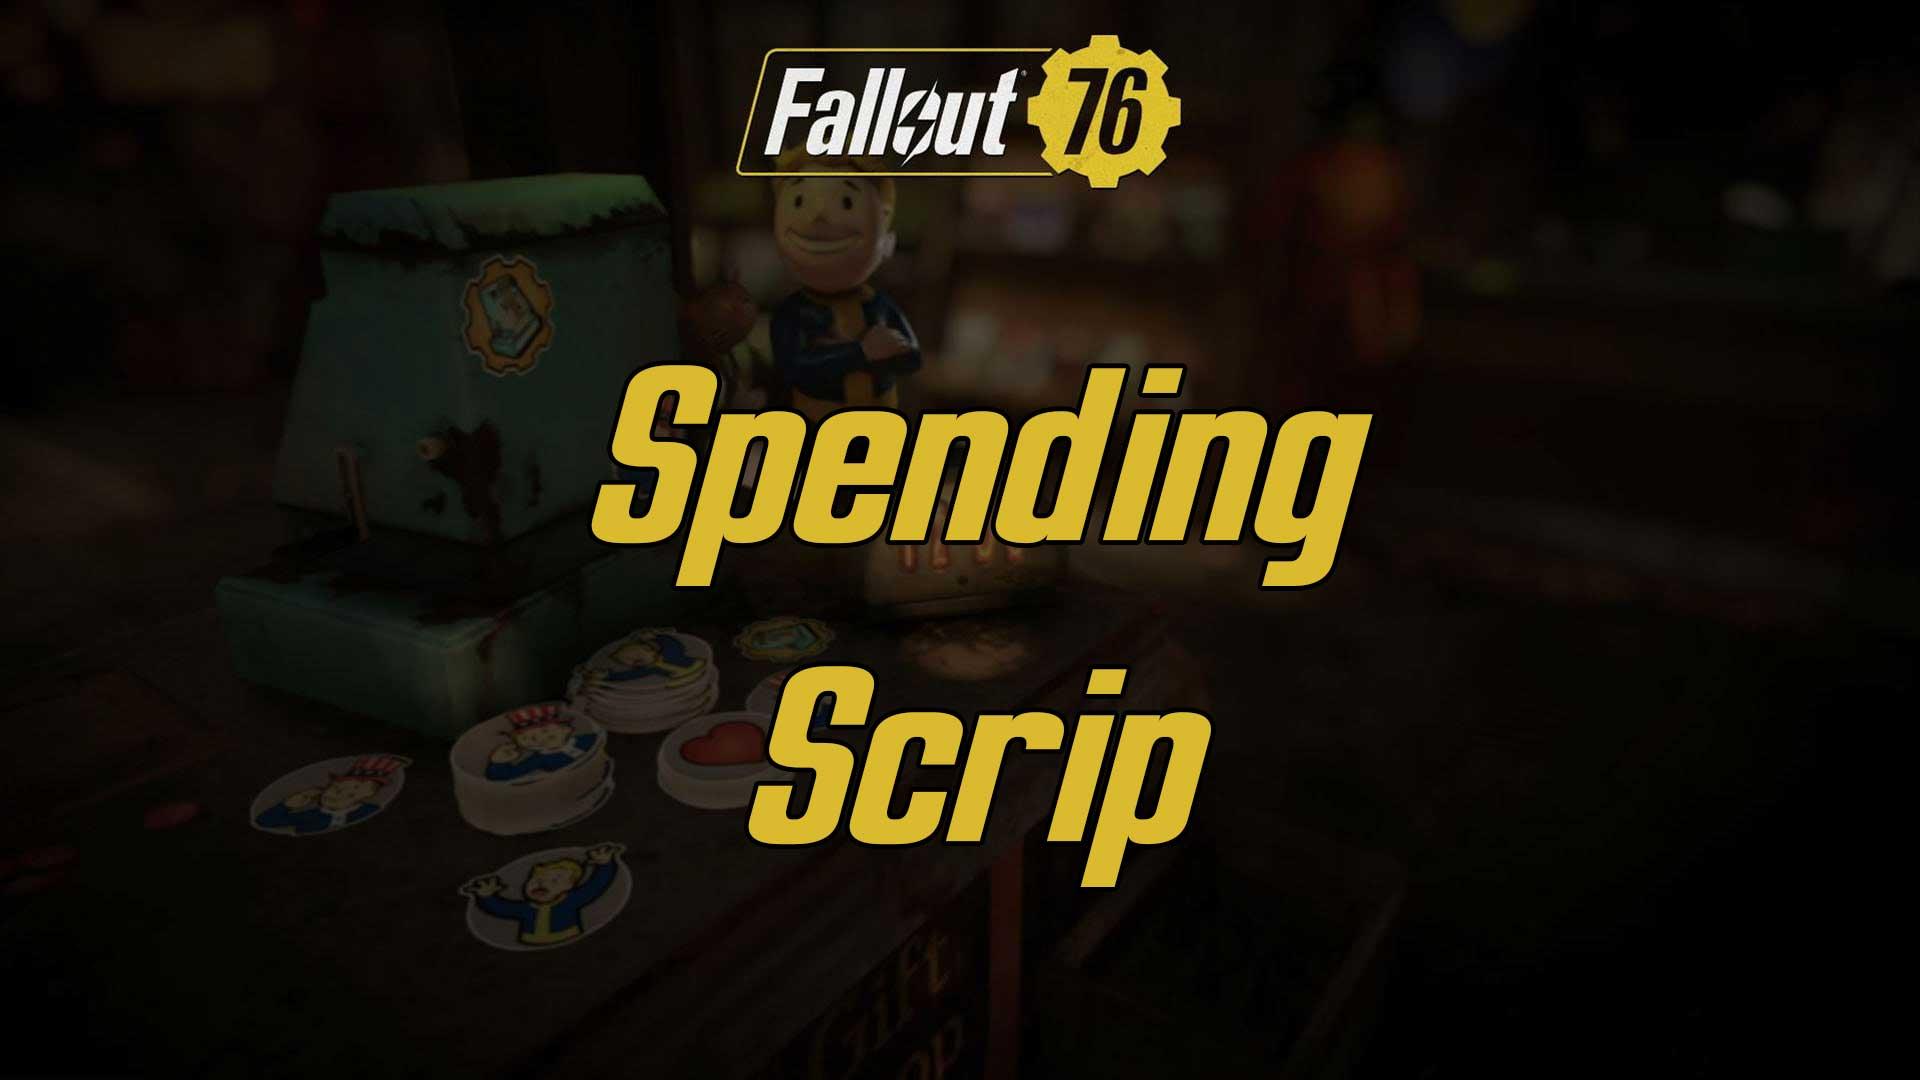 spending scrip